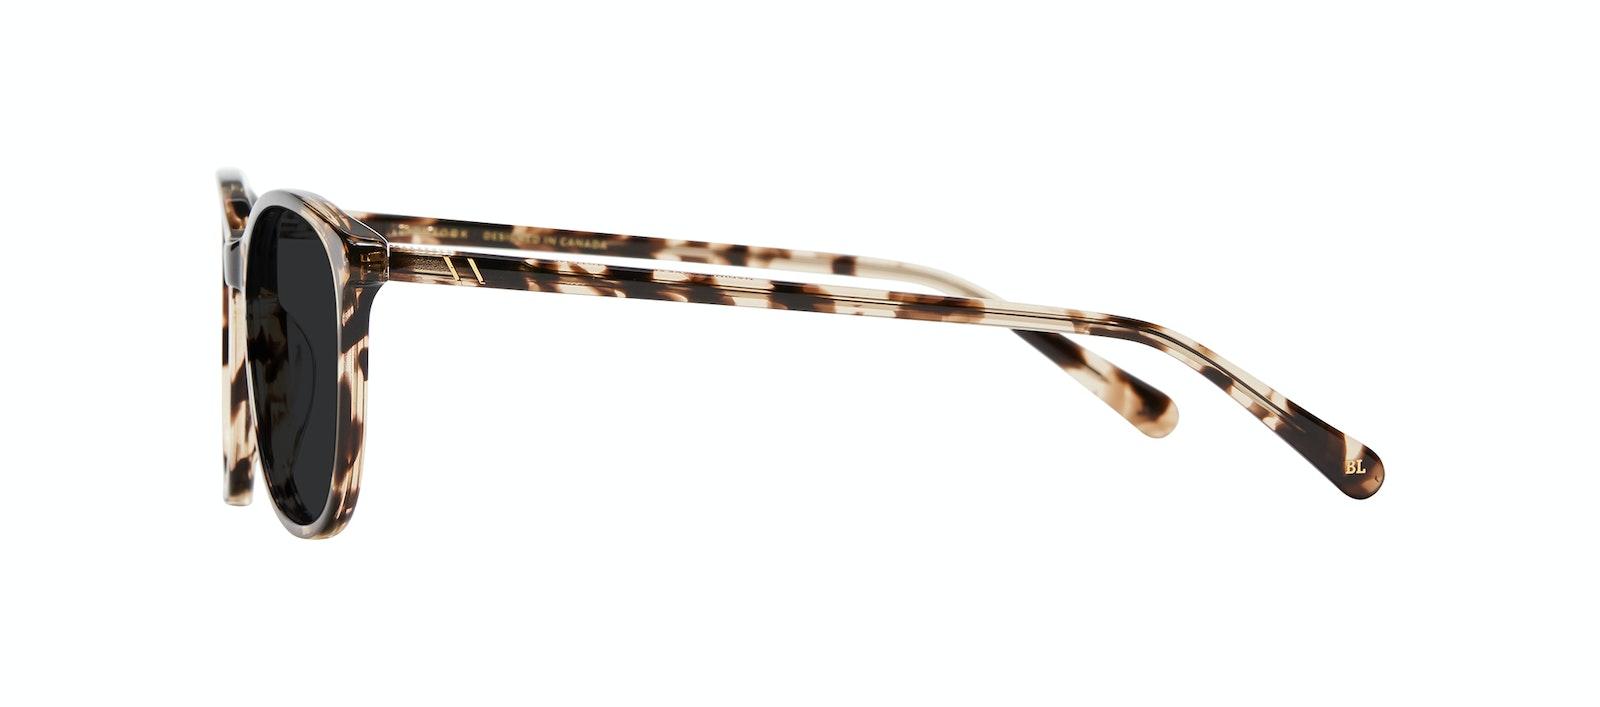 Affordable Fashion Glasses Rectangle Square Round Sunglasses Women Nadine S Snake Skin Side